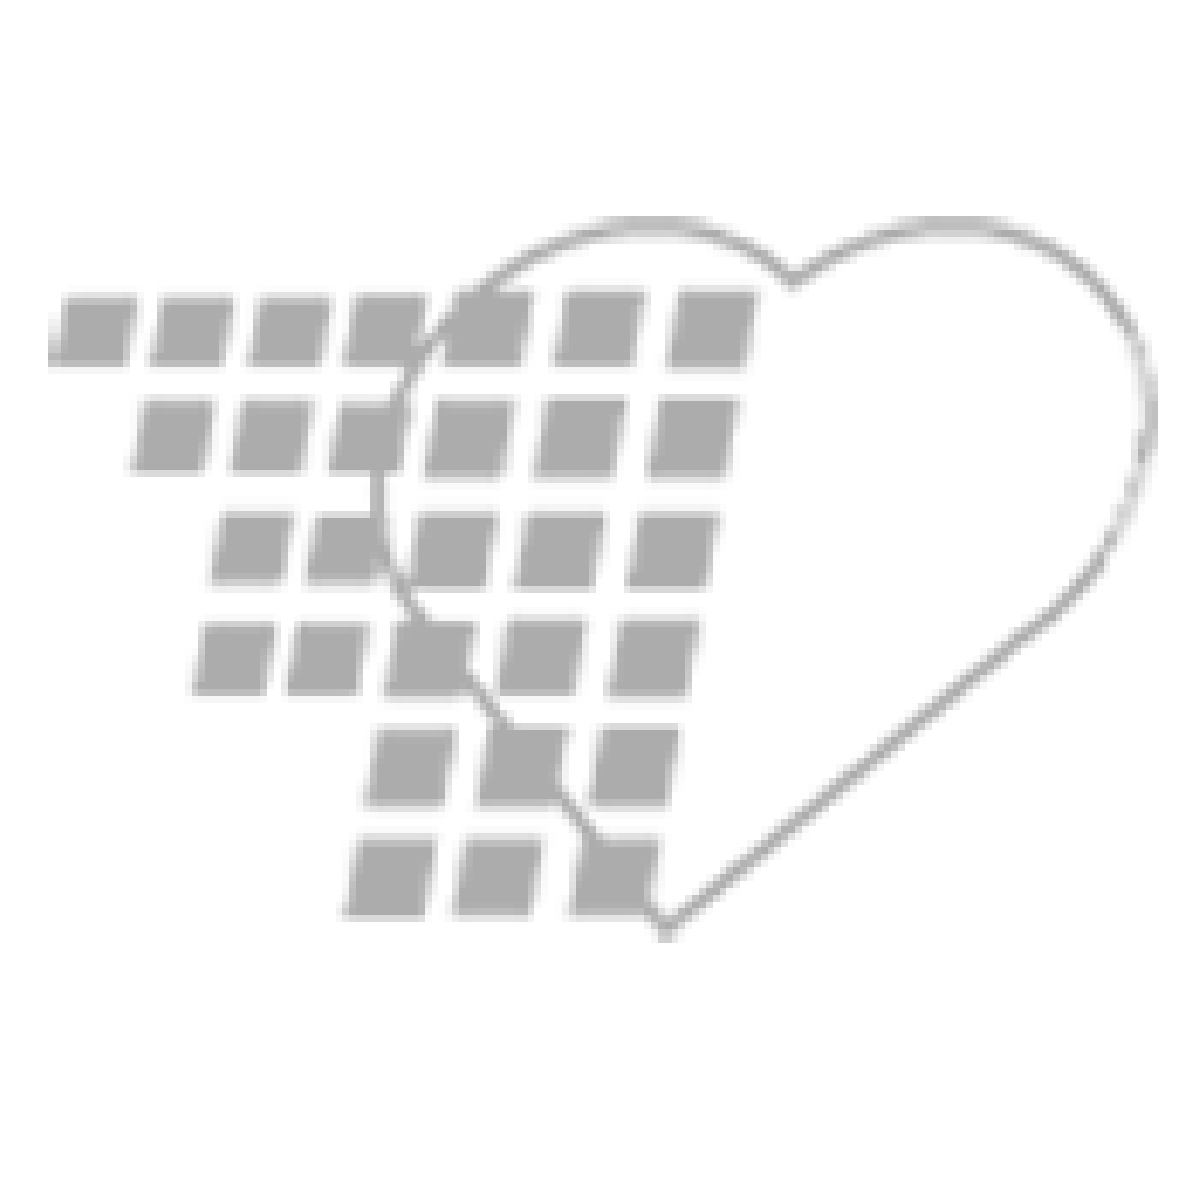 03-04-1210 PURELL™  Foaming Hand Sanitizer Dispenser with Sanitizer